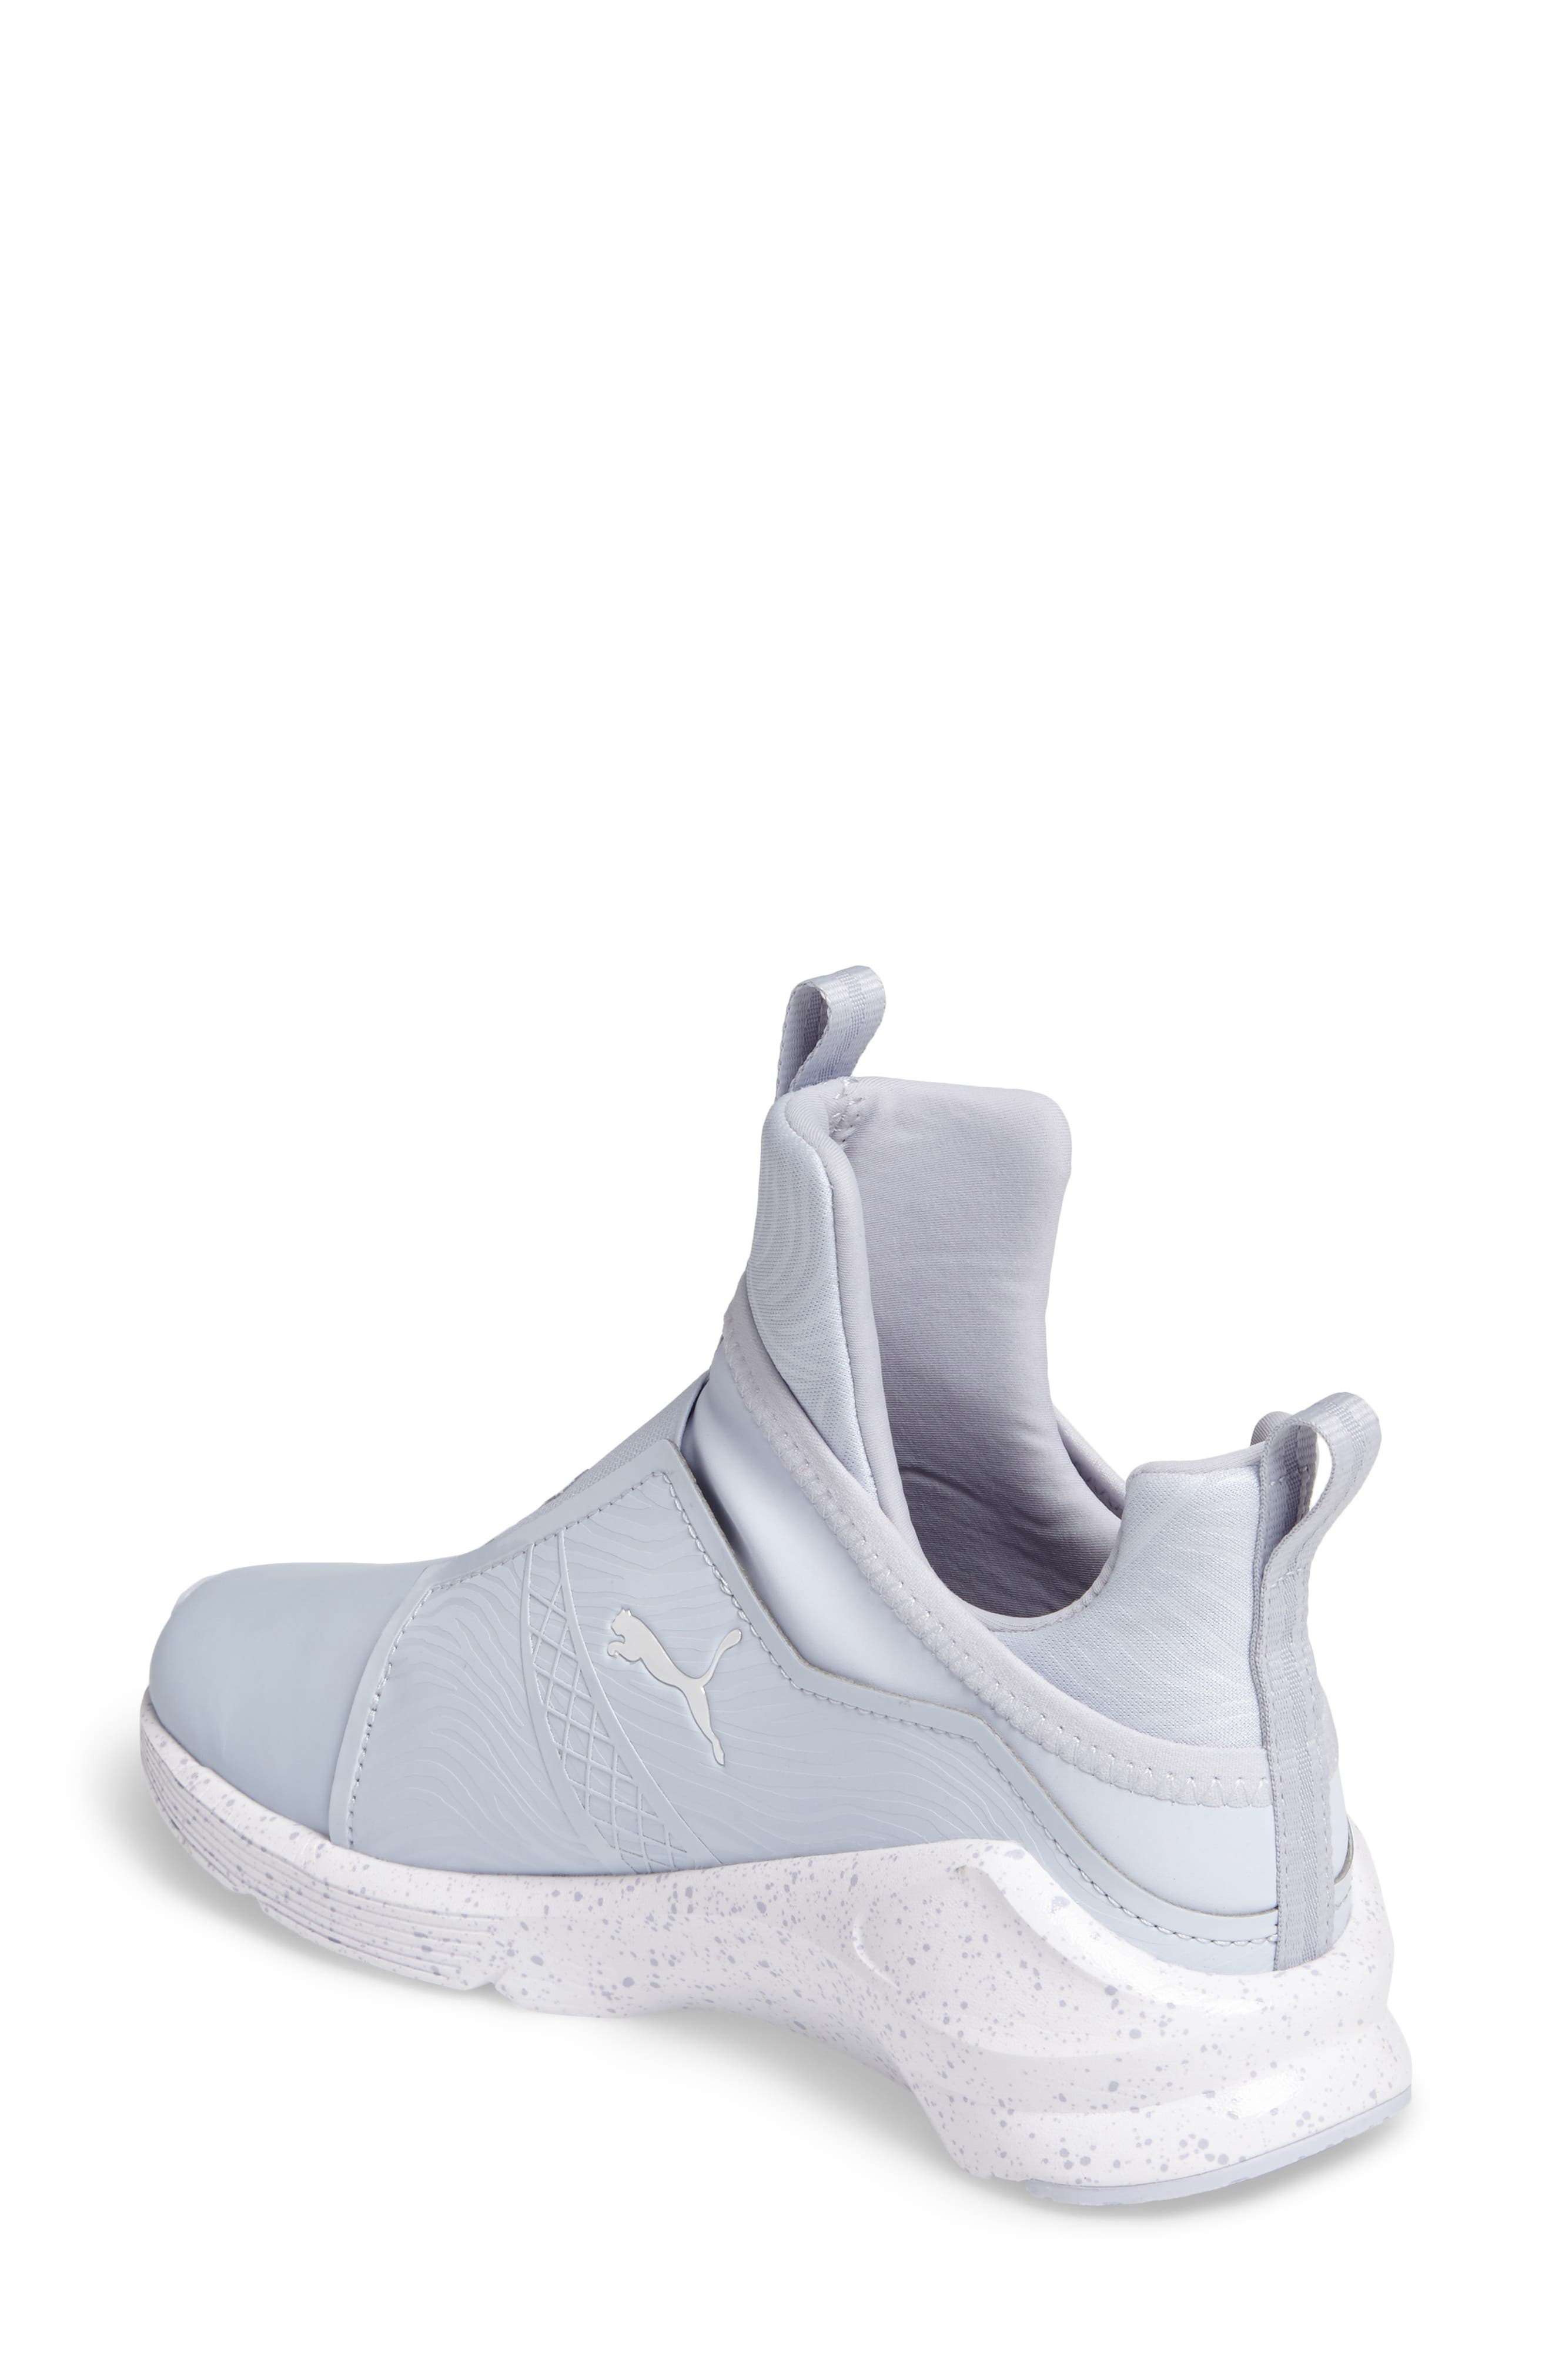 Fierce Bleached High Top Sneaker,                             Alternate thumbnail 2, color,                             400